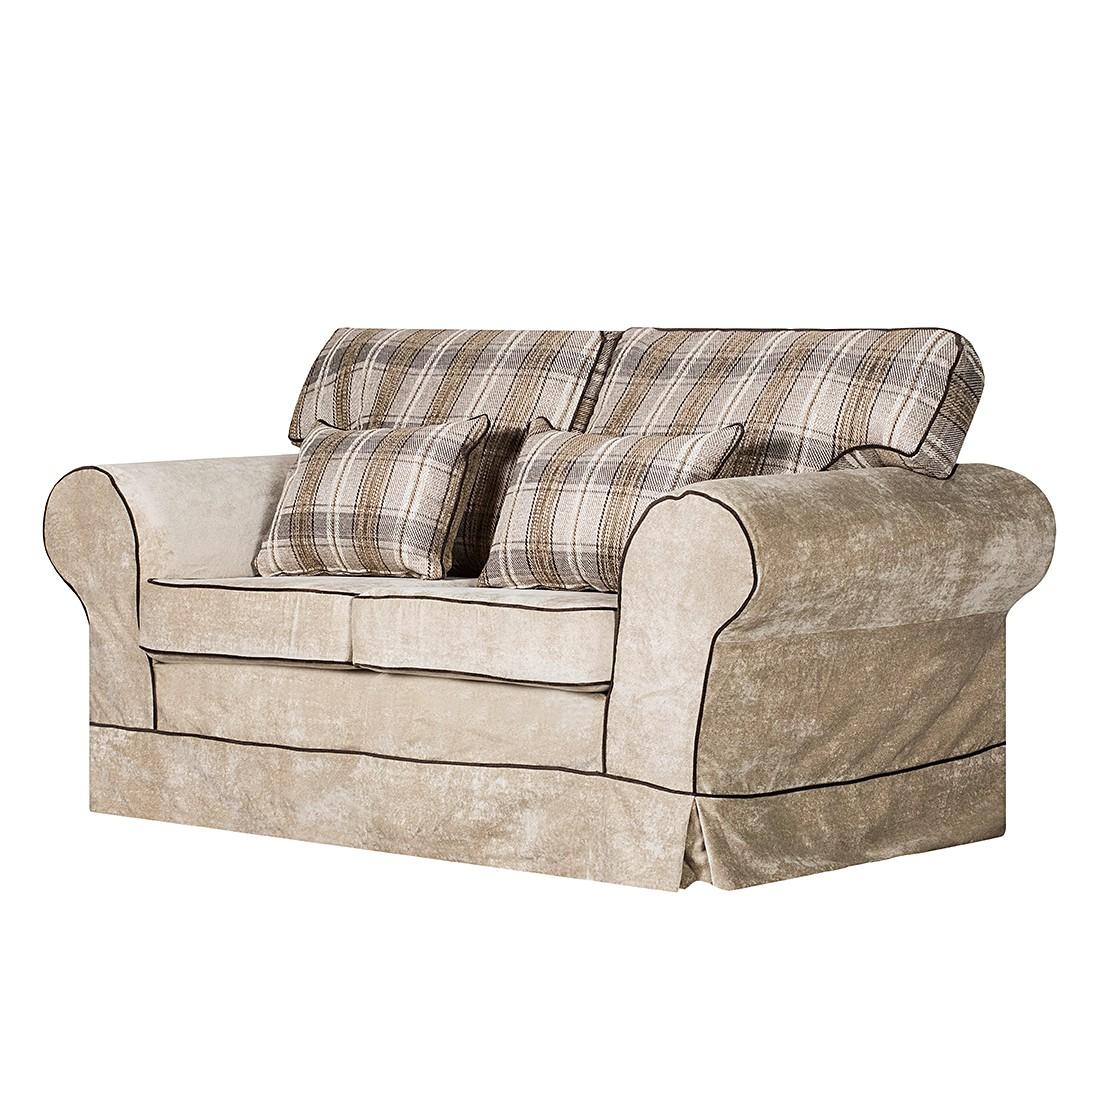 Sofa Bradford (2-Sitzer) – Samtstoff Beige – Karomuster, Maison Belfort bestellen